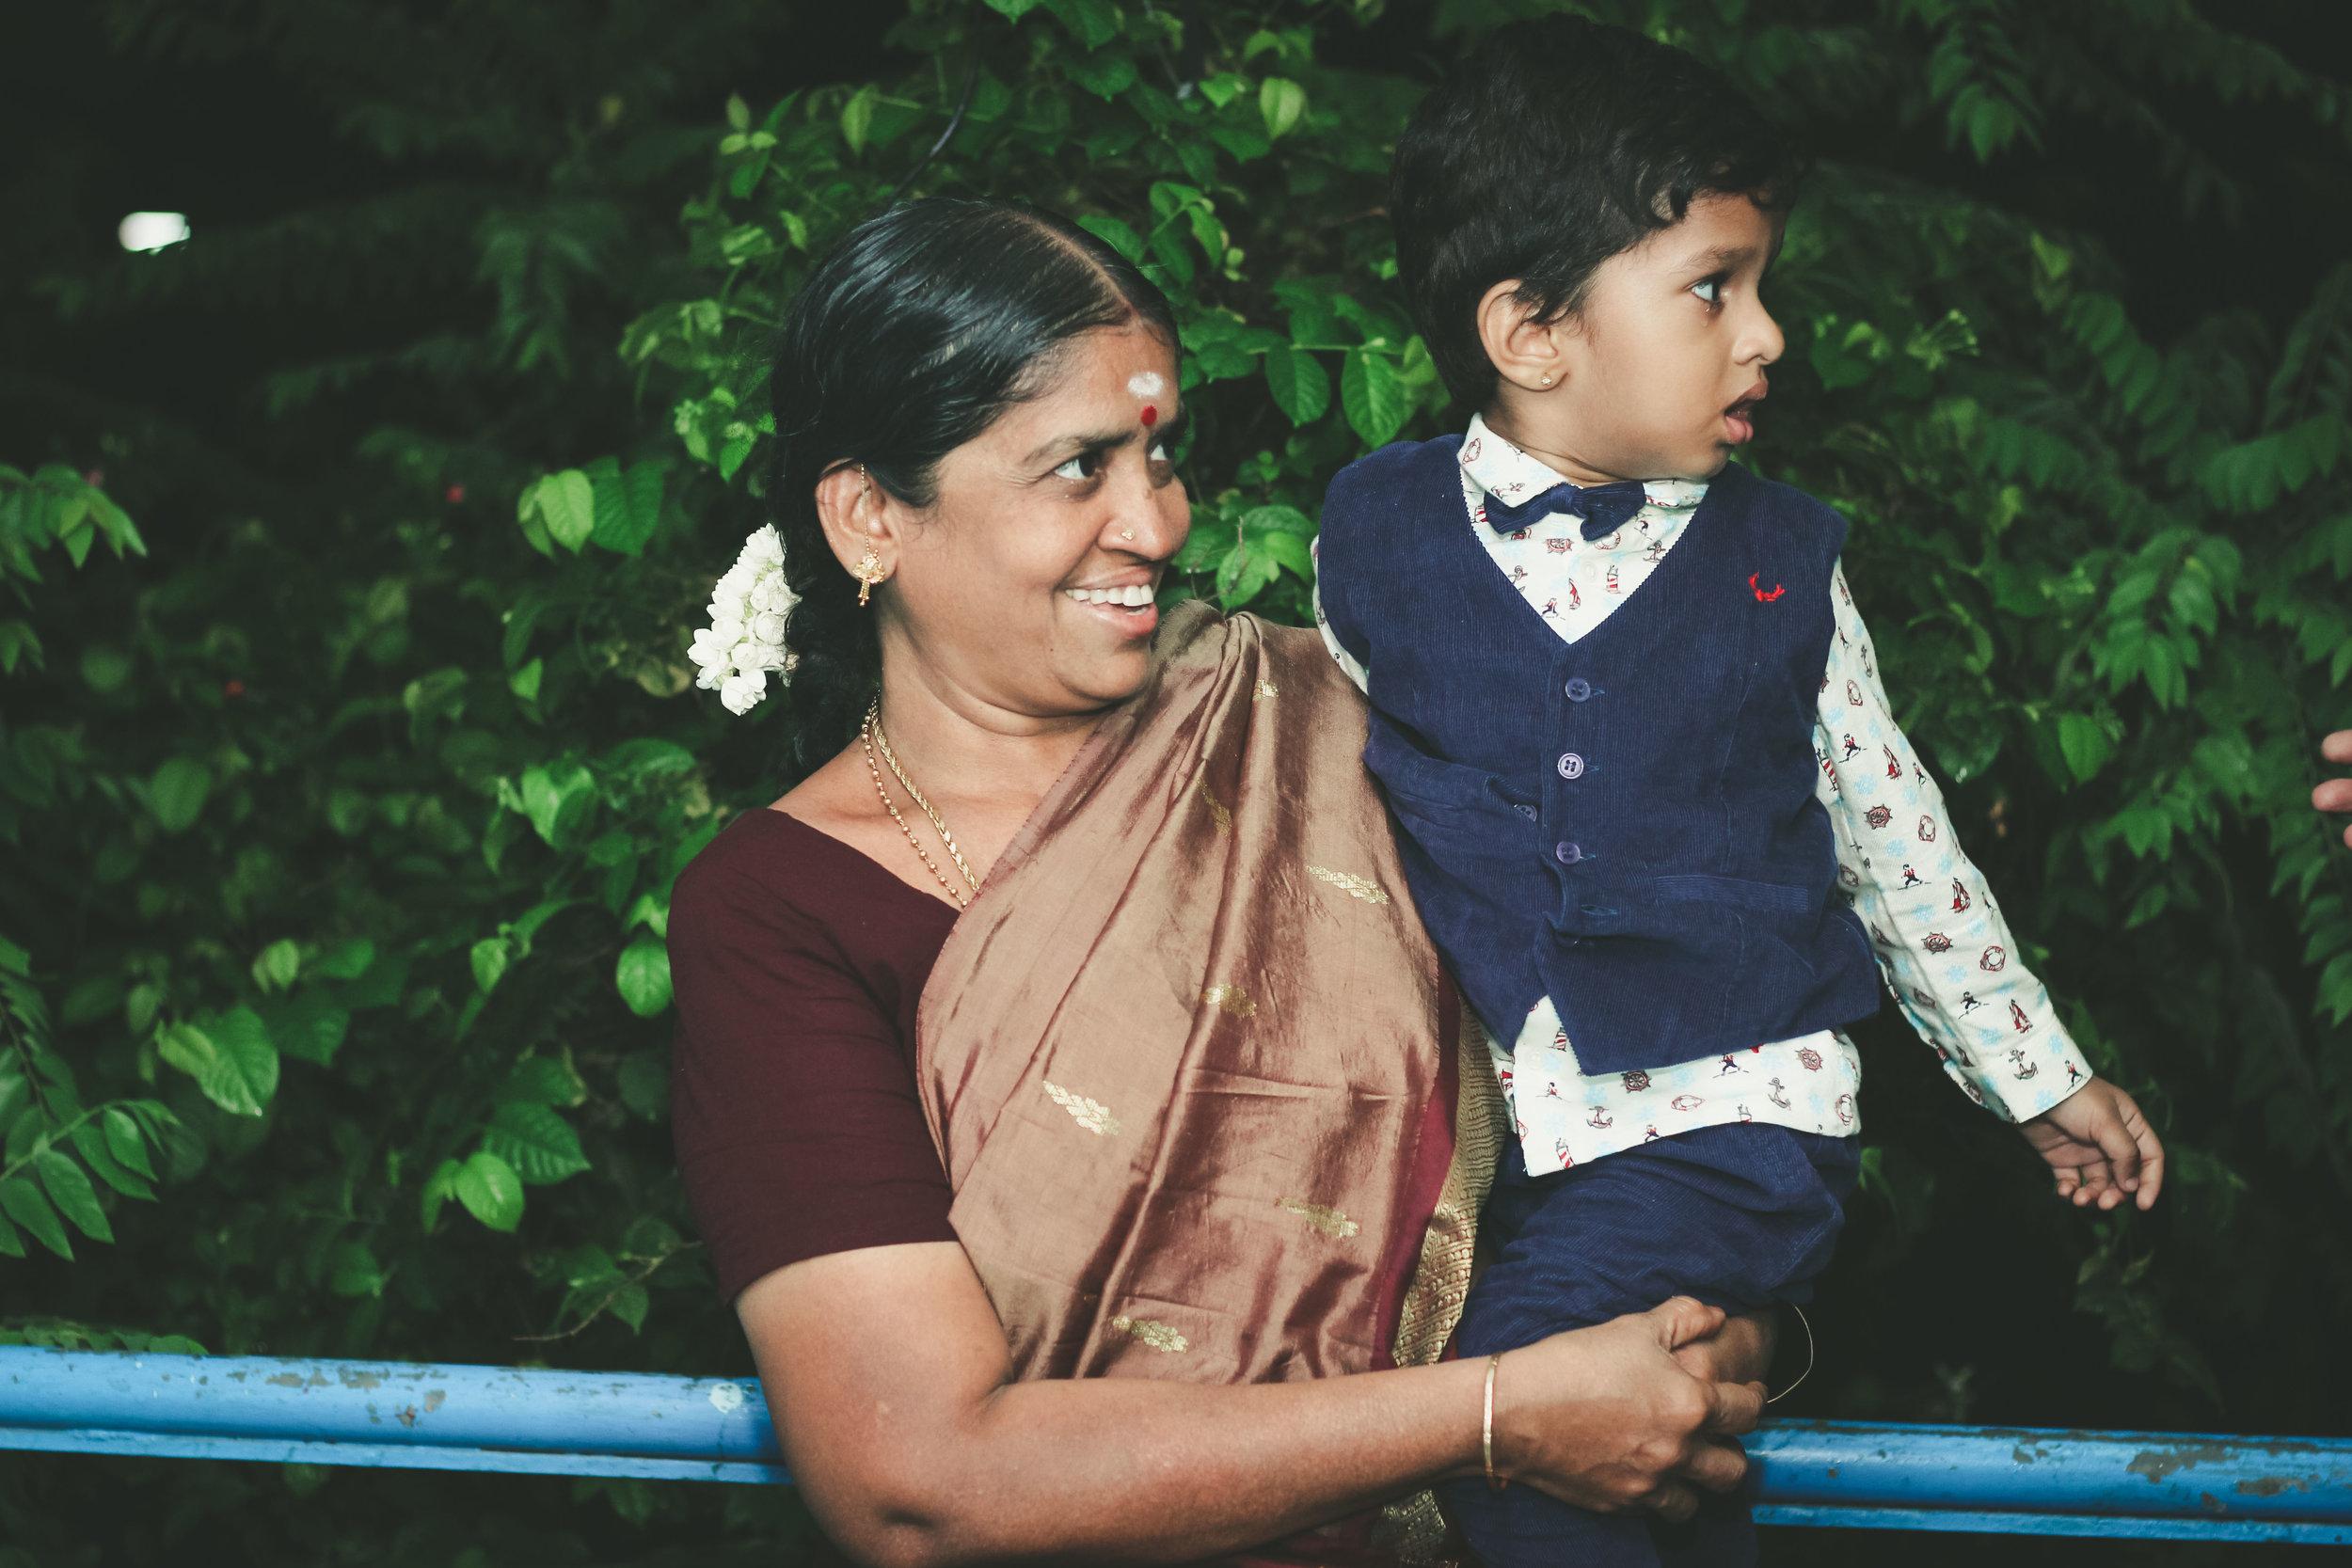 Saathvik with his grandmother during his 2nd birthday celerbation